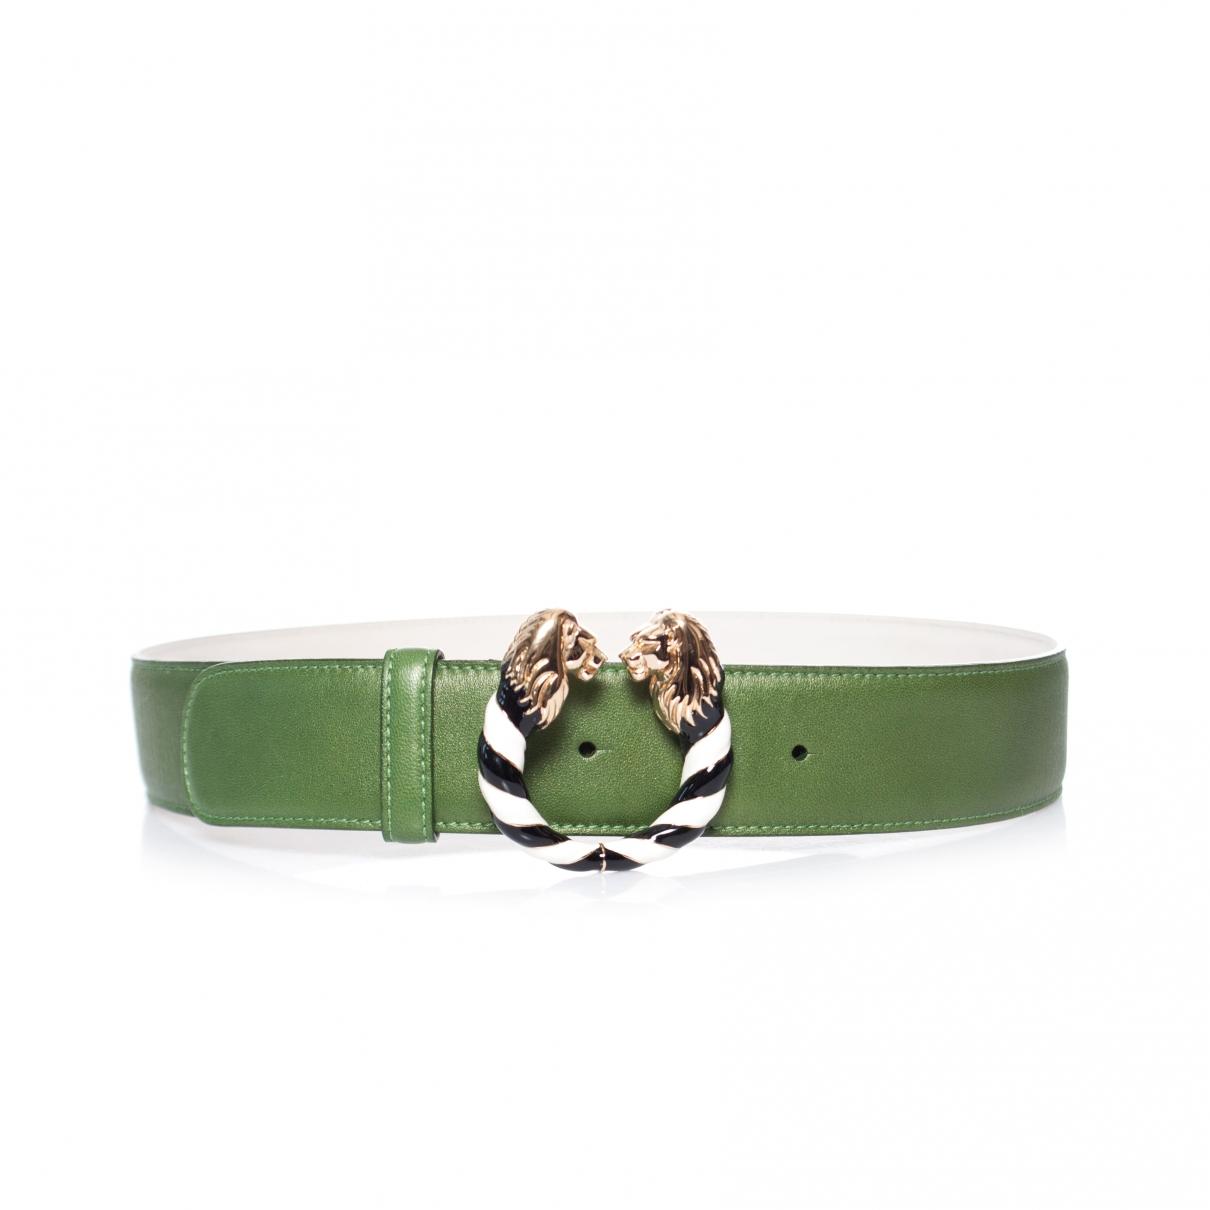 Bvlgari \N Green Leather belt for Women S International